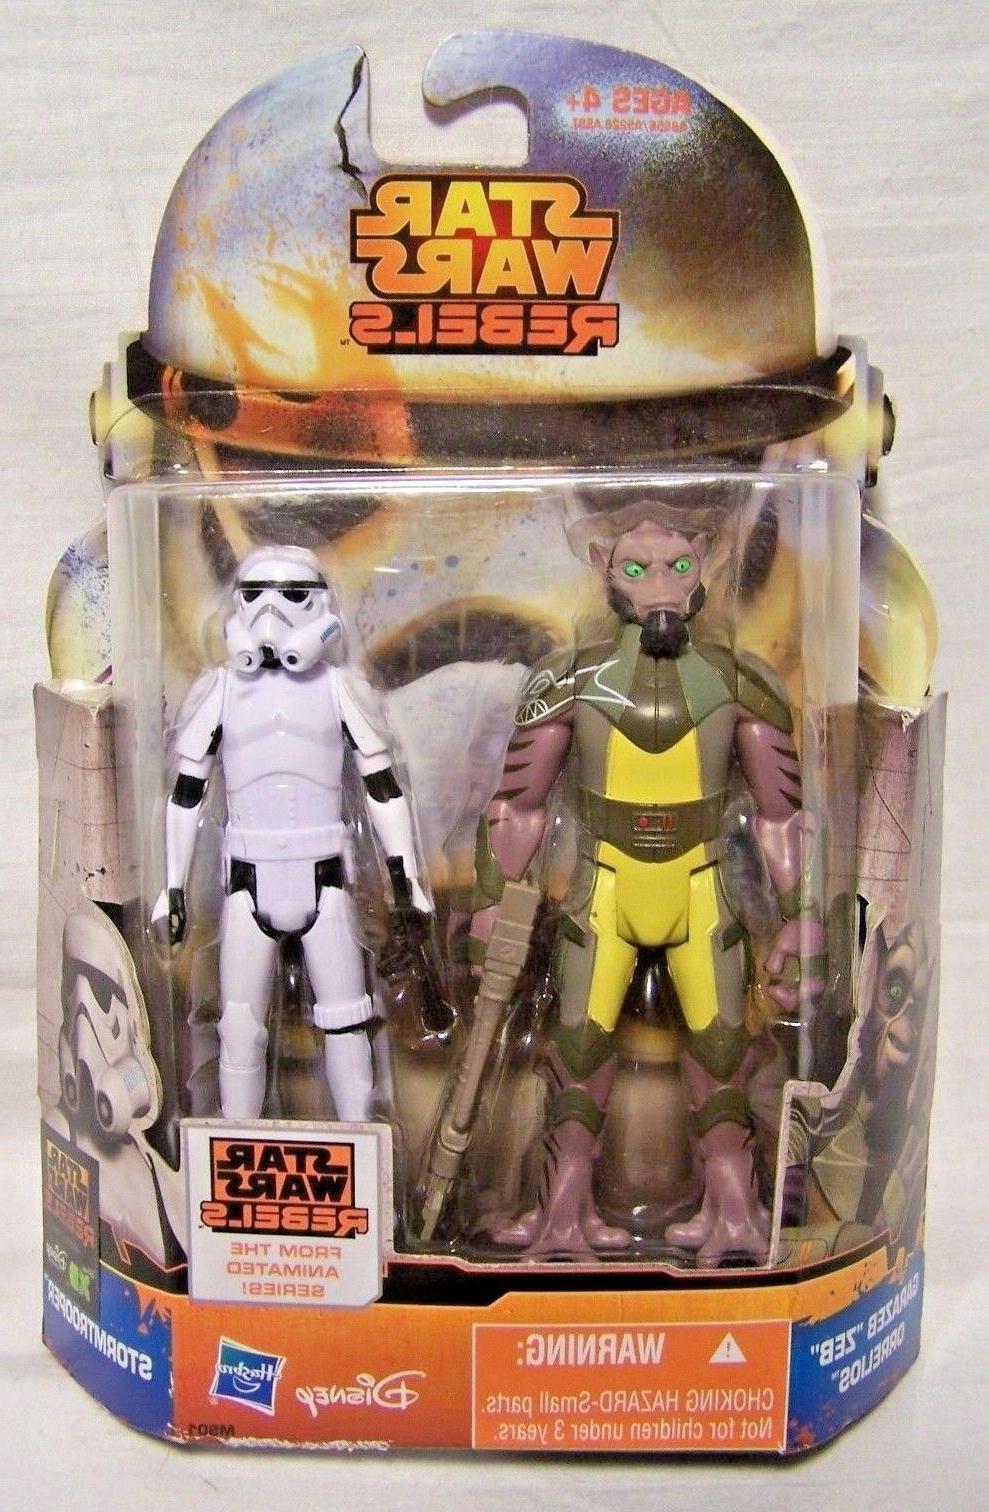 Star Wars Rebels 2 Pack Garazeb 'Zeb' Orrelios & Stormtroope